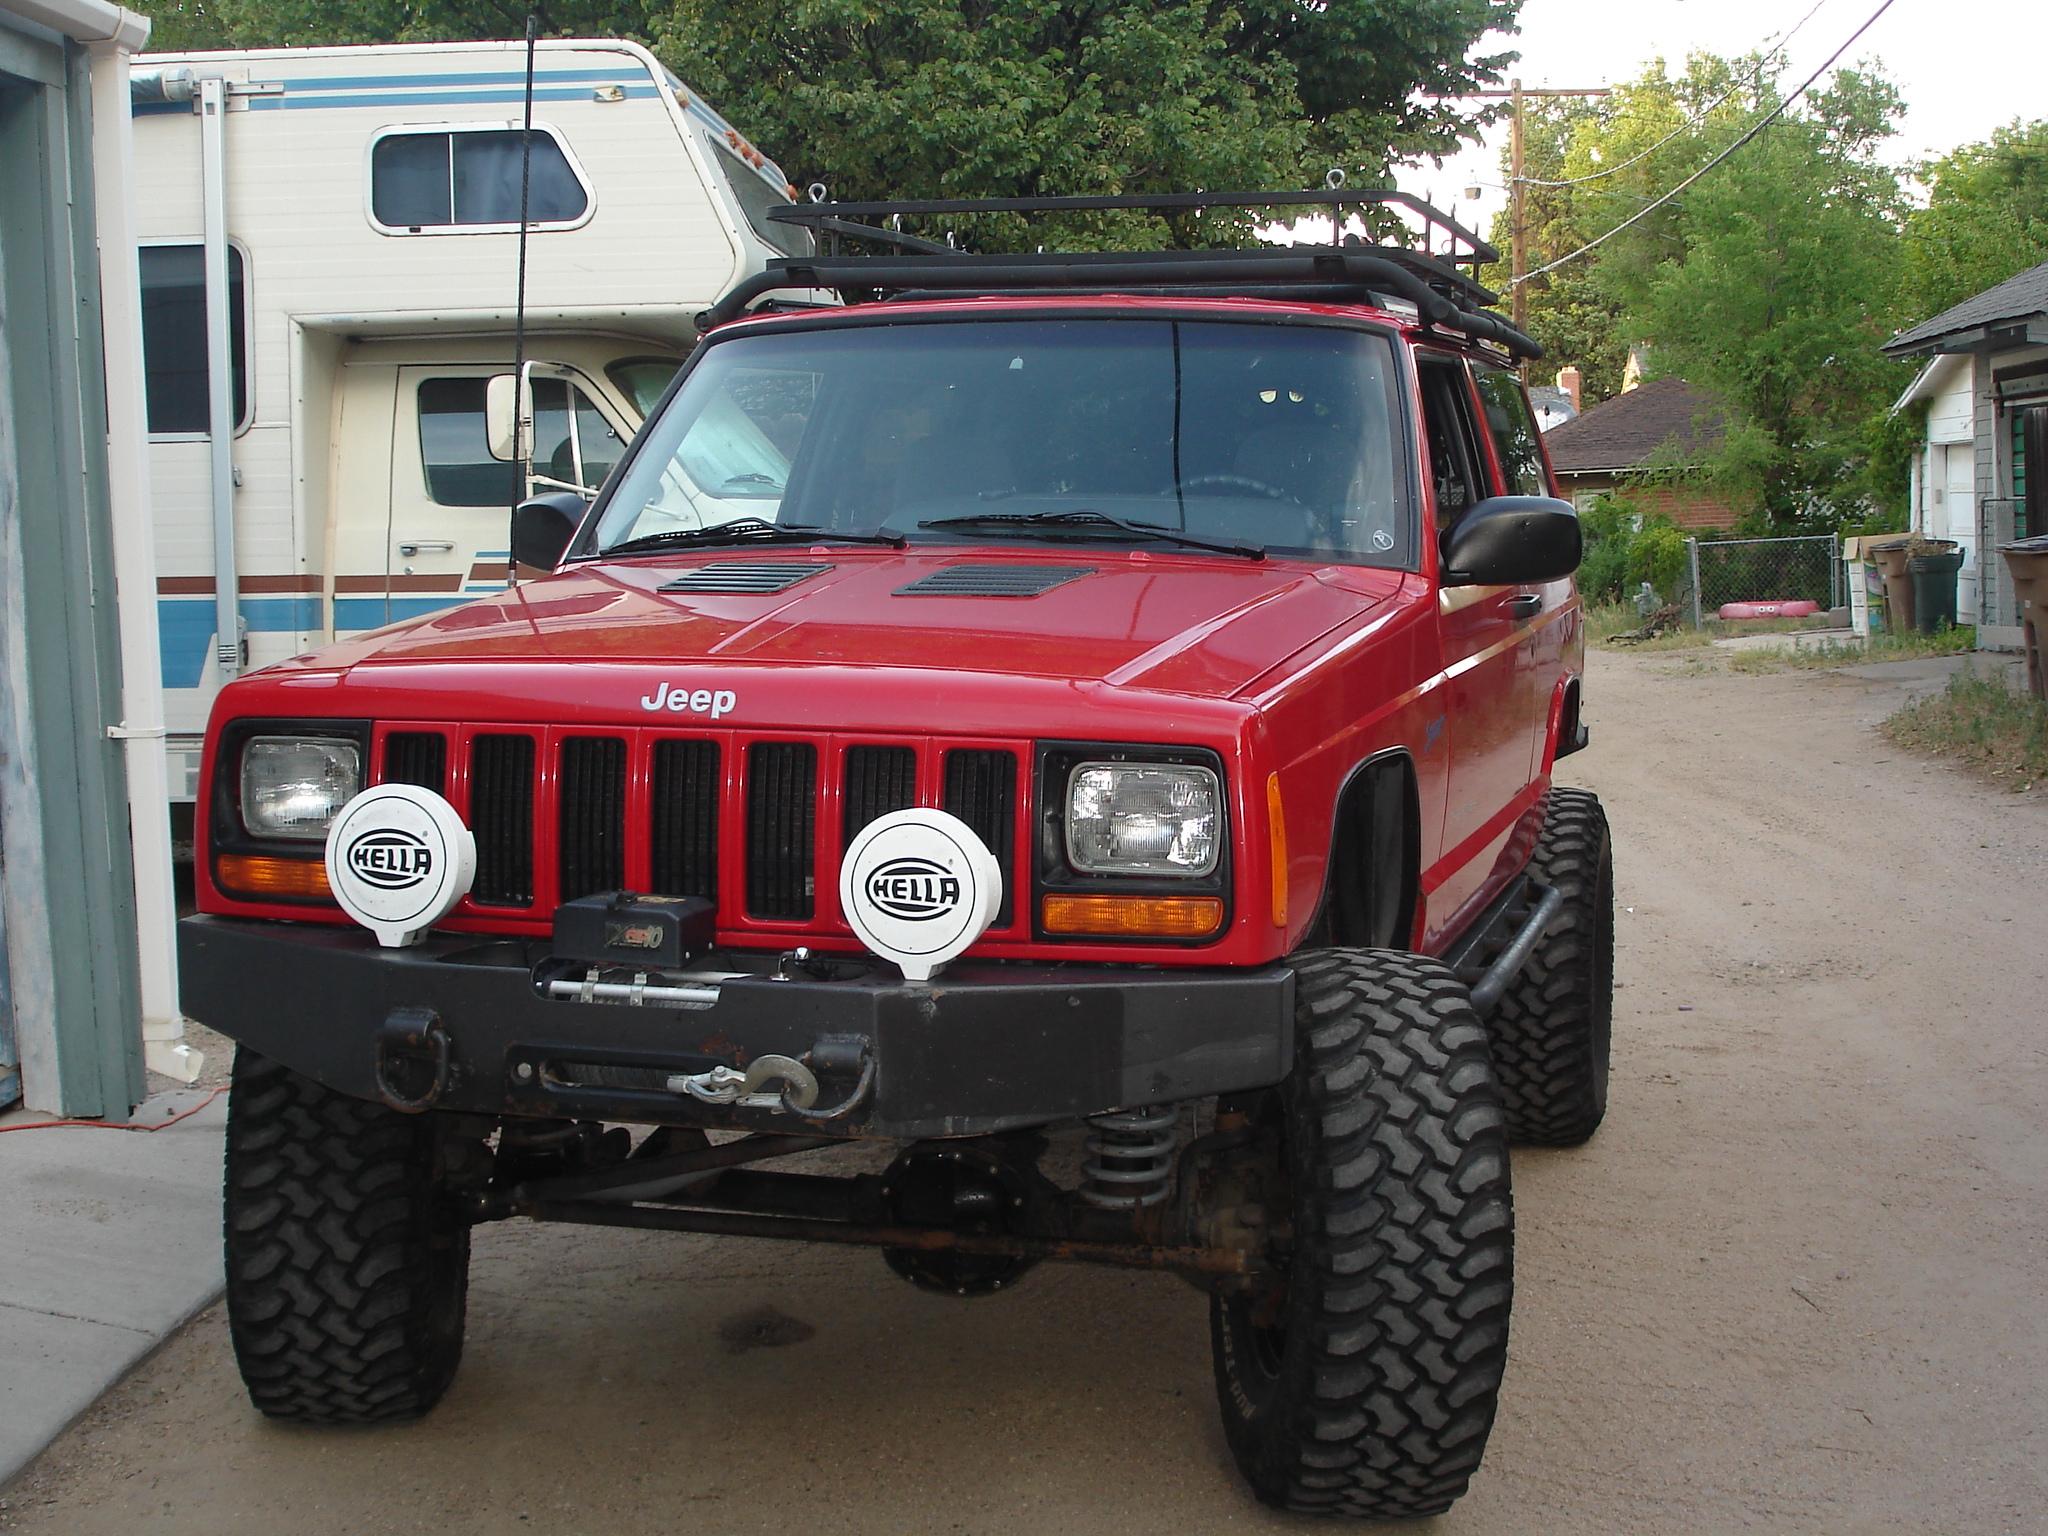 98_Jeep_Cherokee_Sport_001.jpg